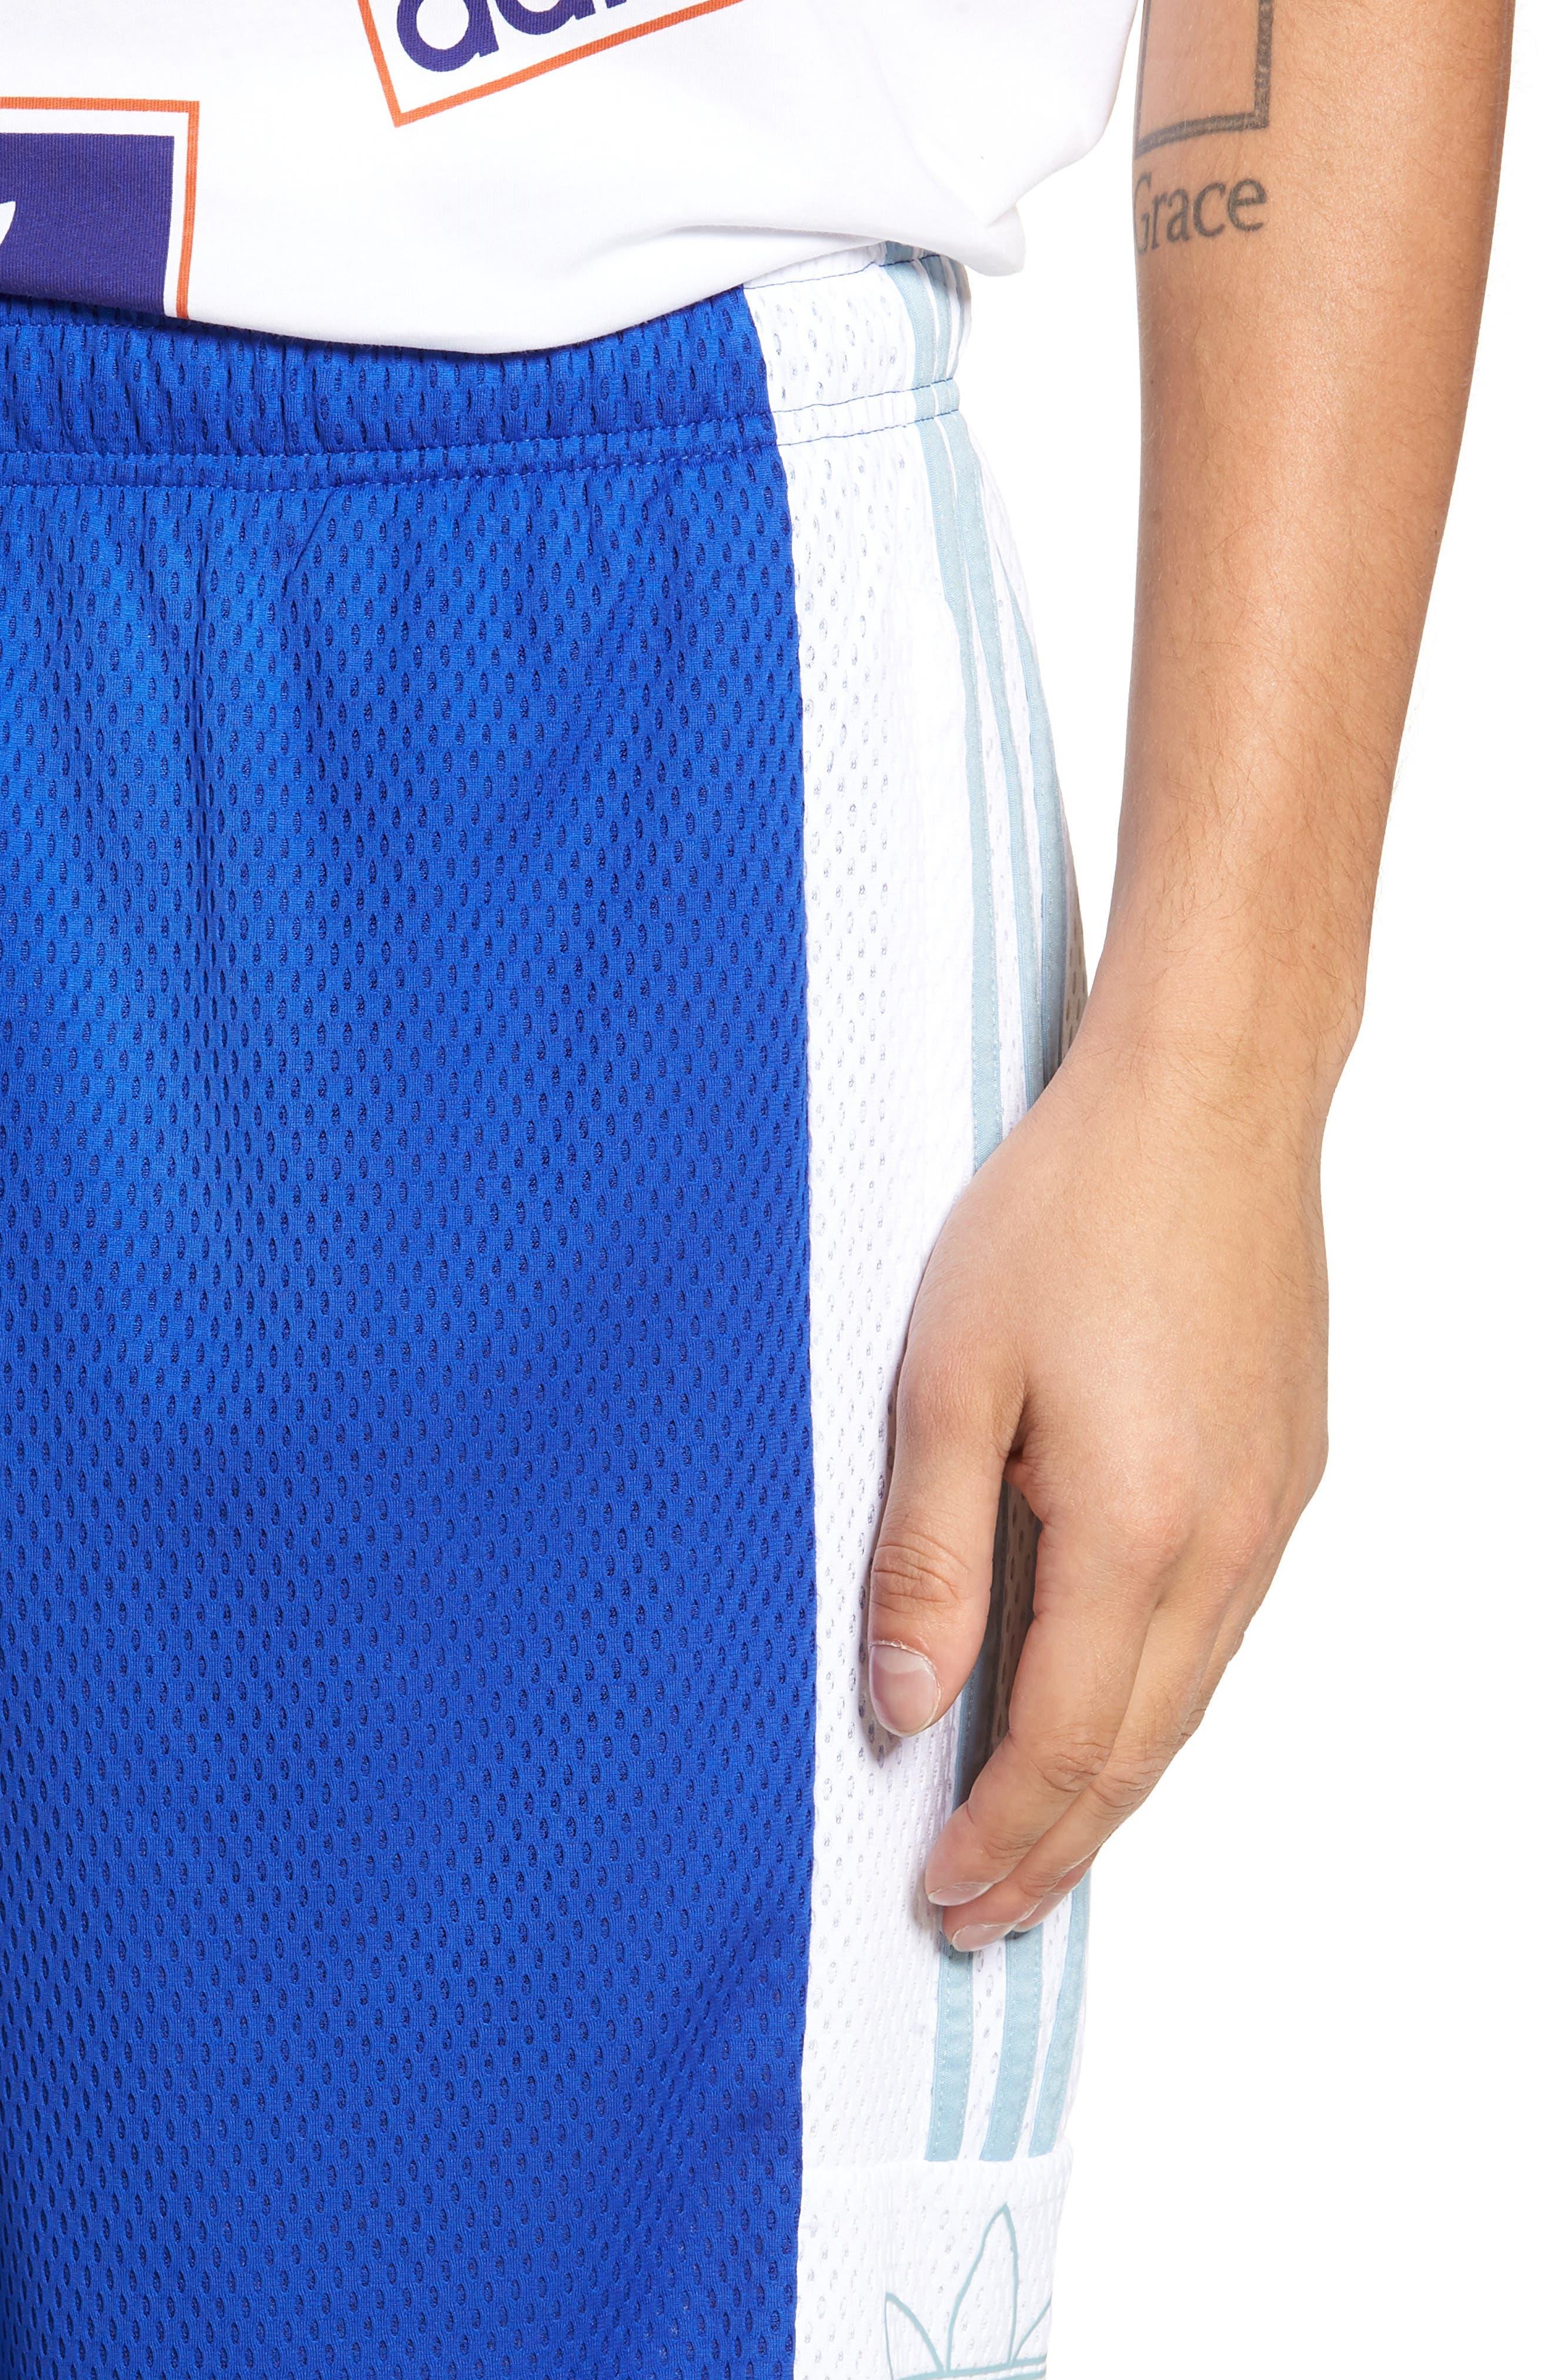 ADIDAS ORIGINALS, Mesh Athletic Shorts, Alternate thumbnail 4, color, BOLD BLUE/ WHITE